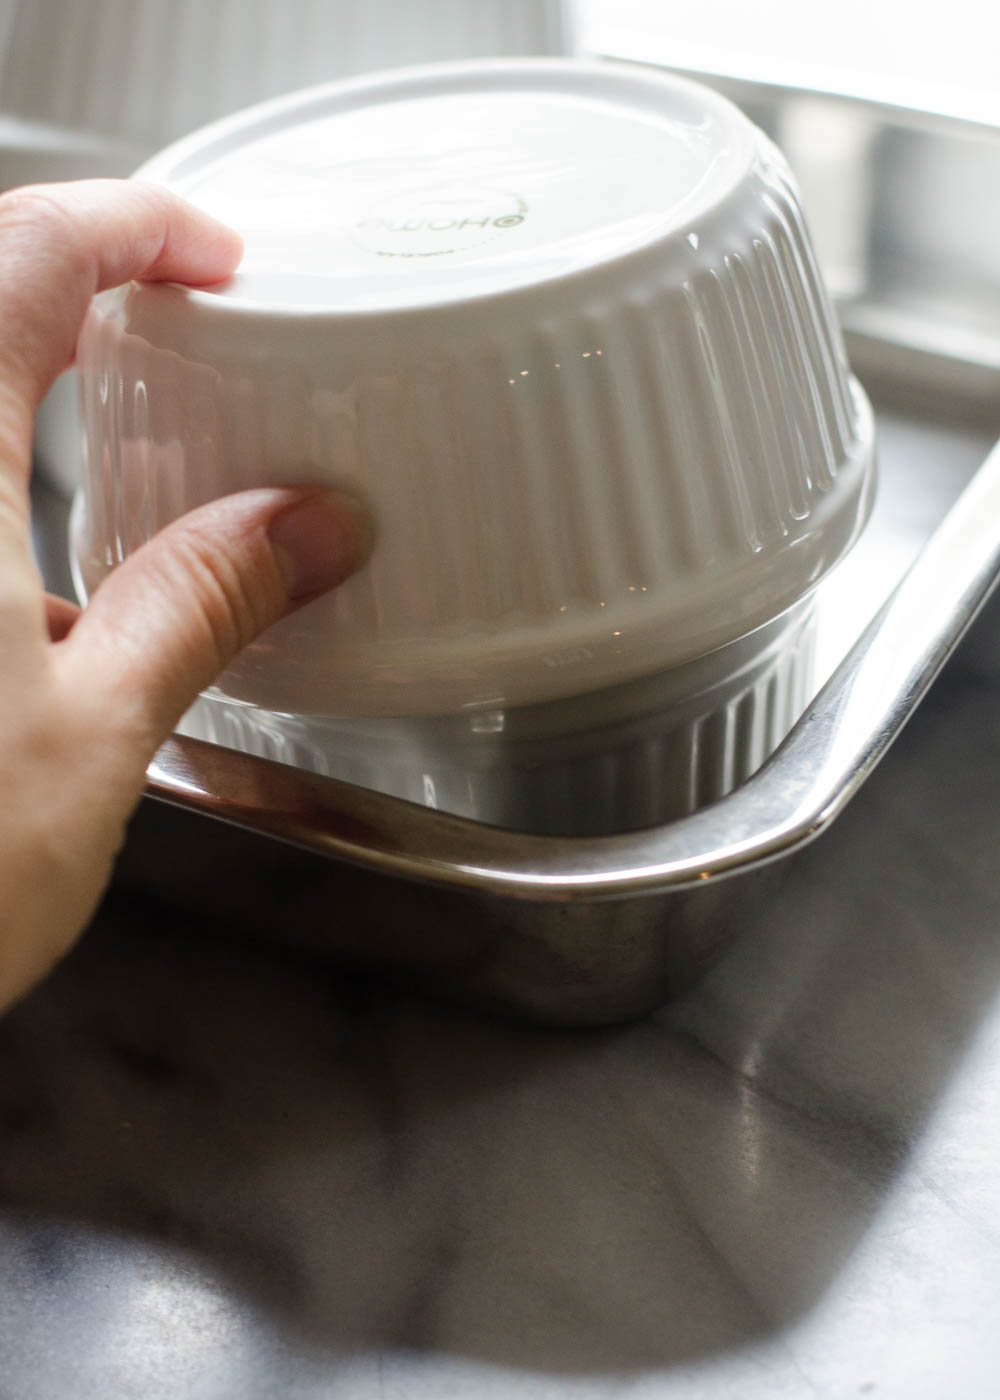 How to Roast Garlic Without Aluminum Foil - Learn how to easily roast garlic without wrapping it in aluminum foil!